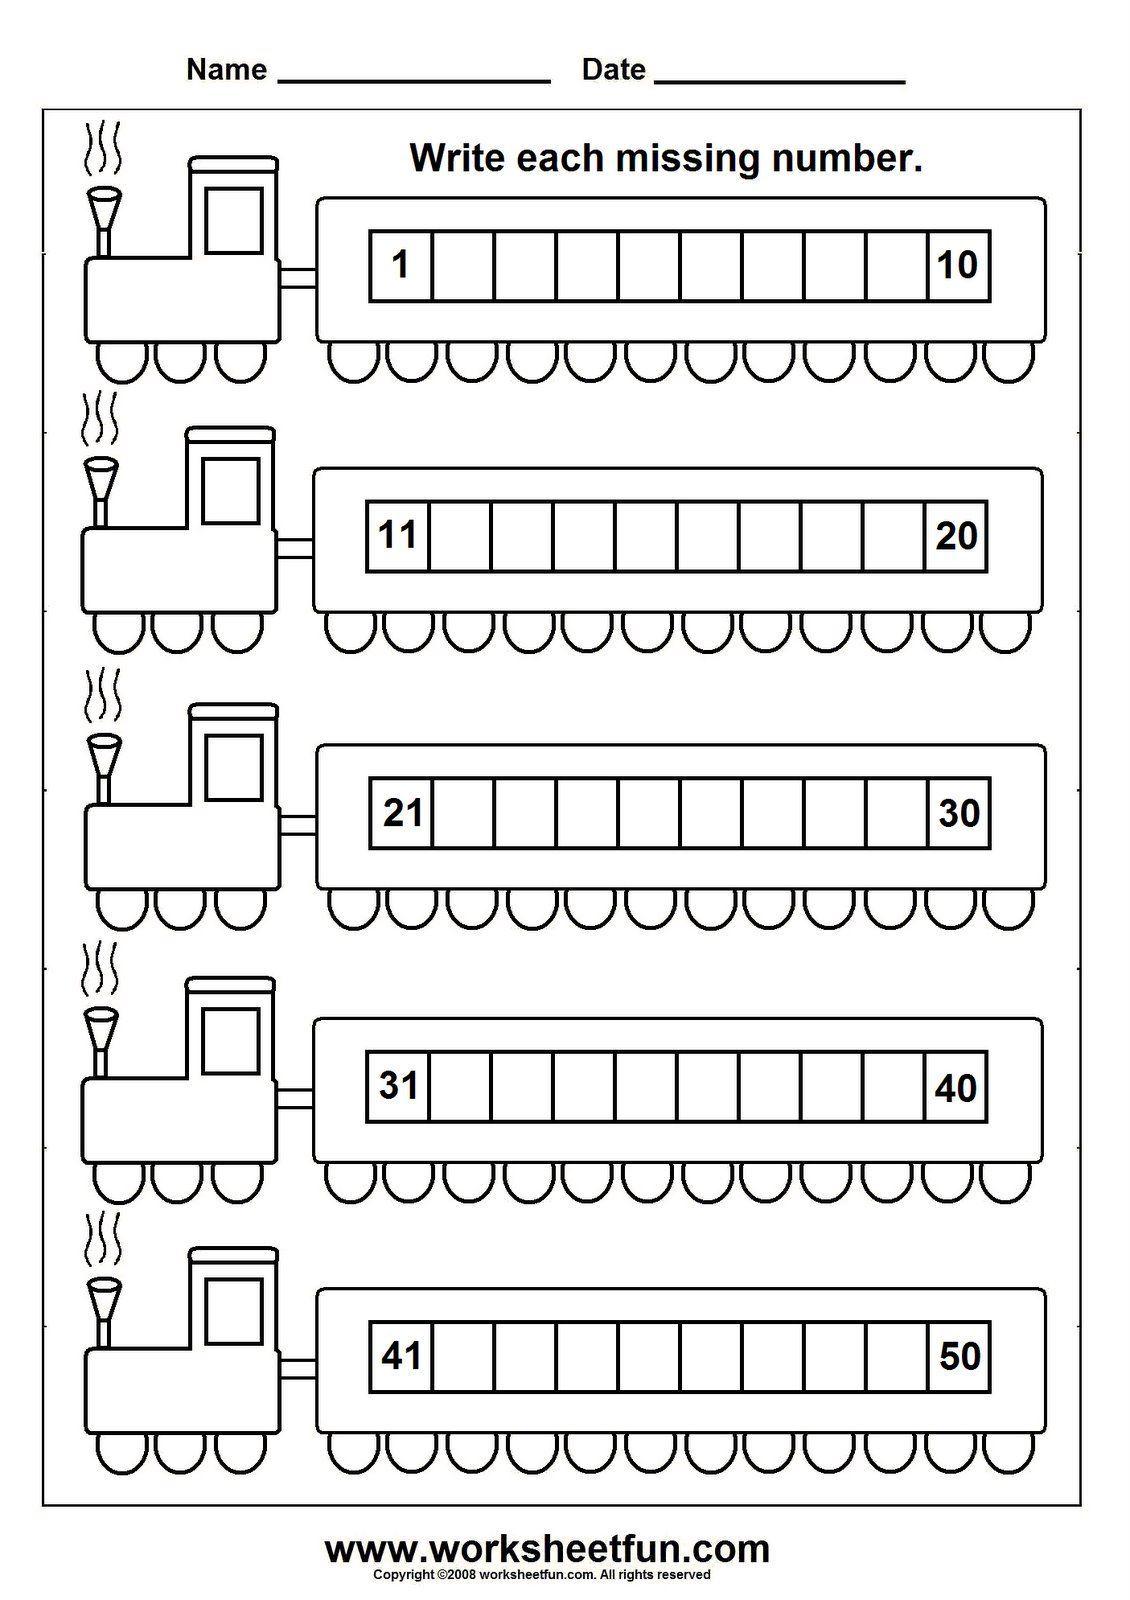 Worksheetfun Free Printable Worksheets Homework Kindergarten Kindergarten Math Worksheets Number Worksheets Kindergarten Kindergarten Worksheets